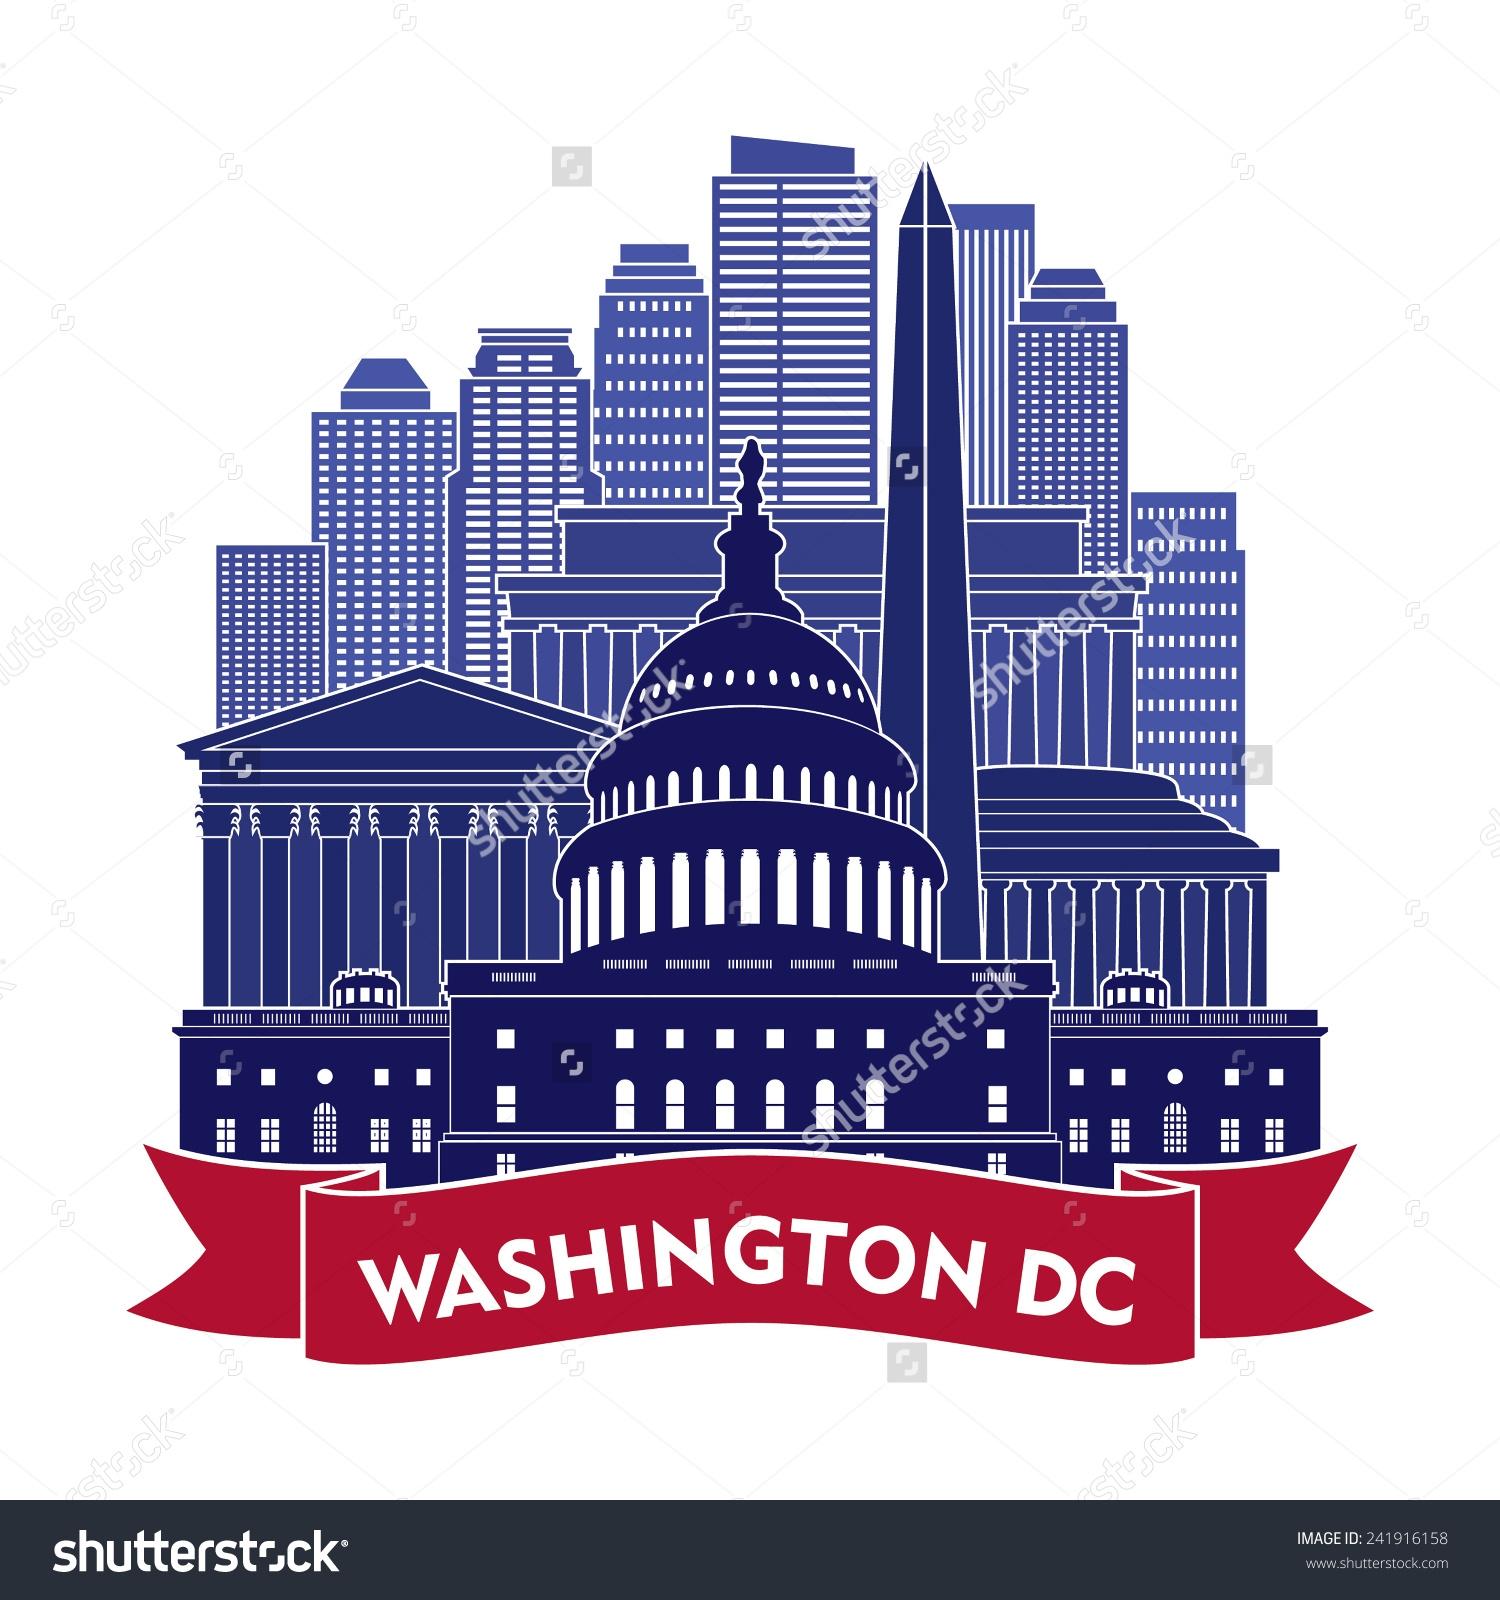 Washington dc clipart.